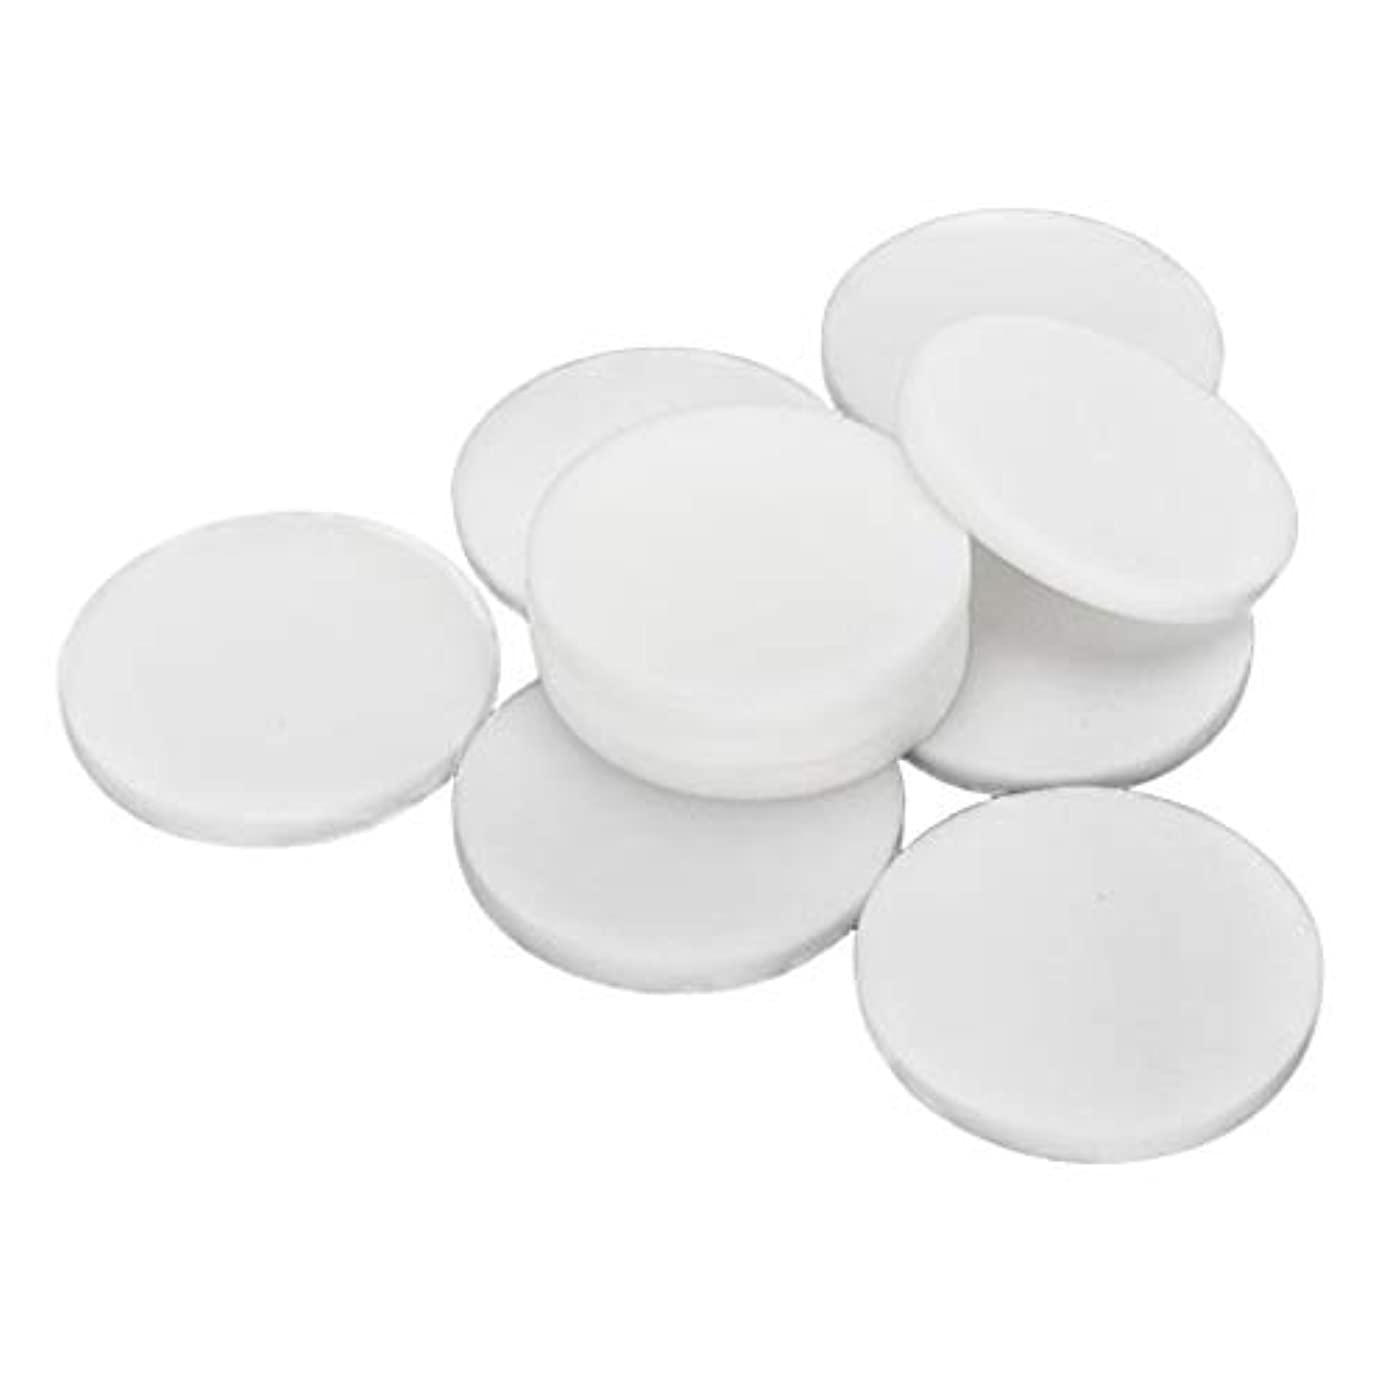 F Fityle 10枚 使い捨て フェイスクリーニングパフ 洗顔 化粧 メイクアップパフ 2サイズ選べ - 大